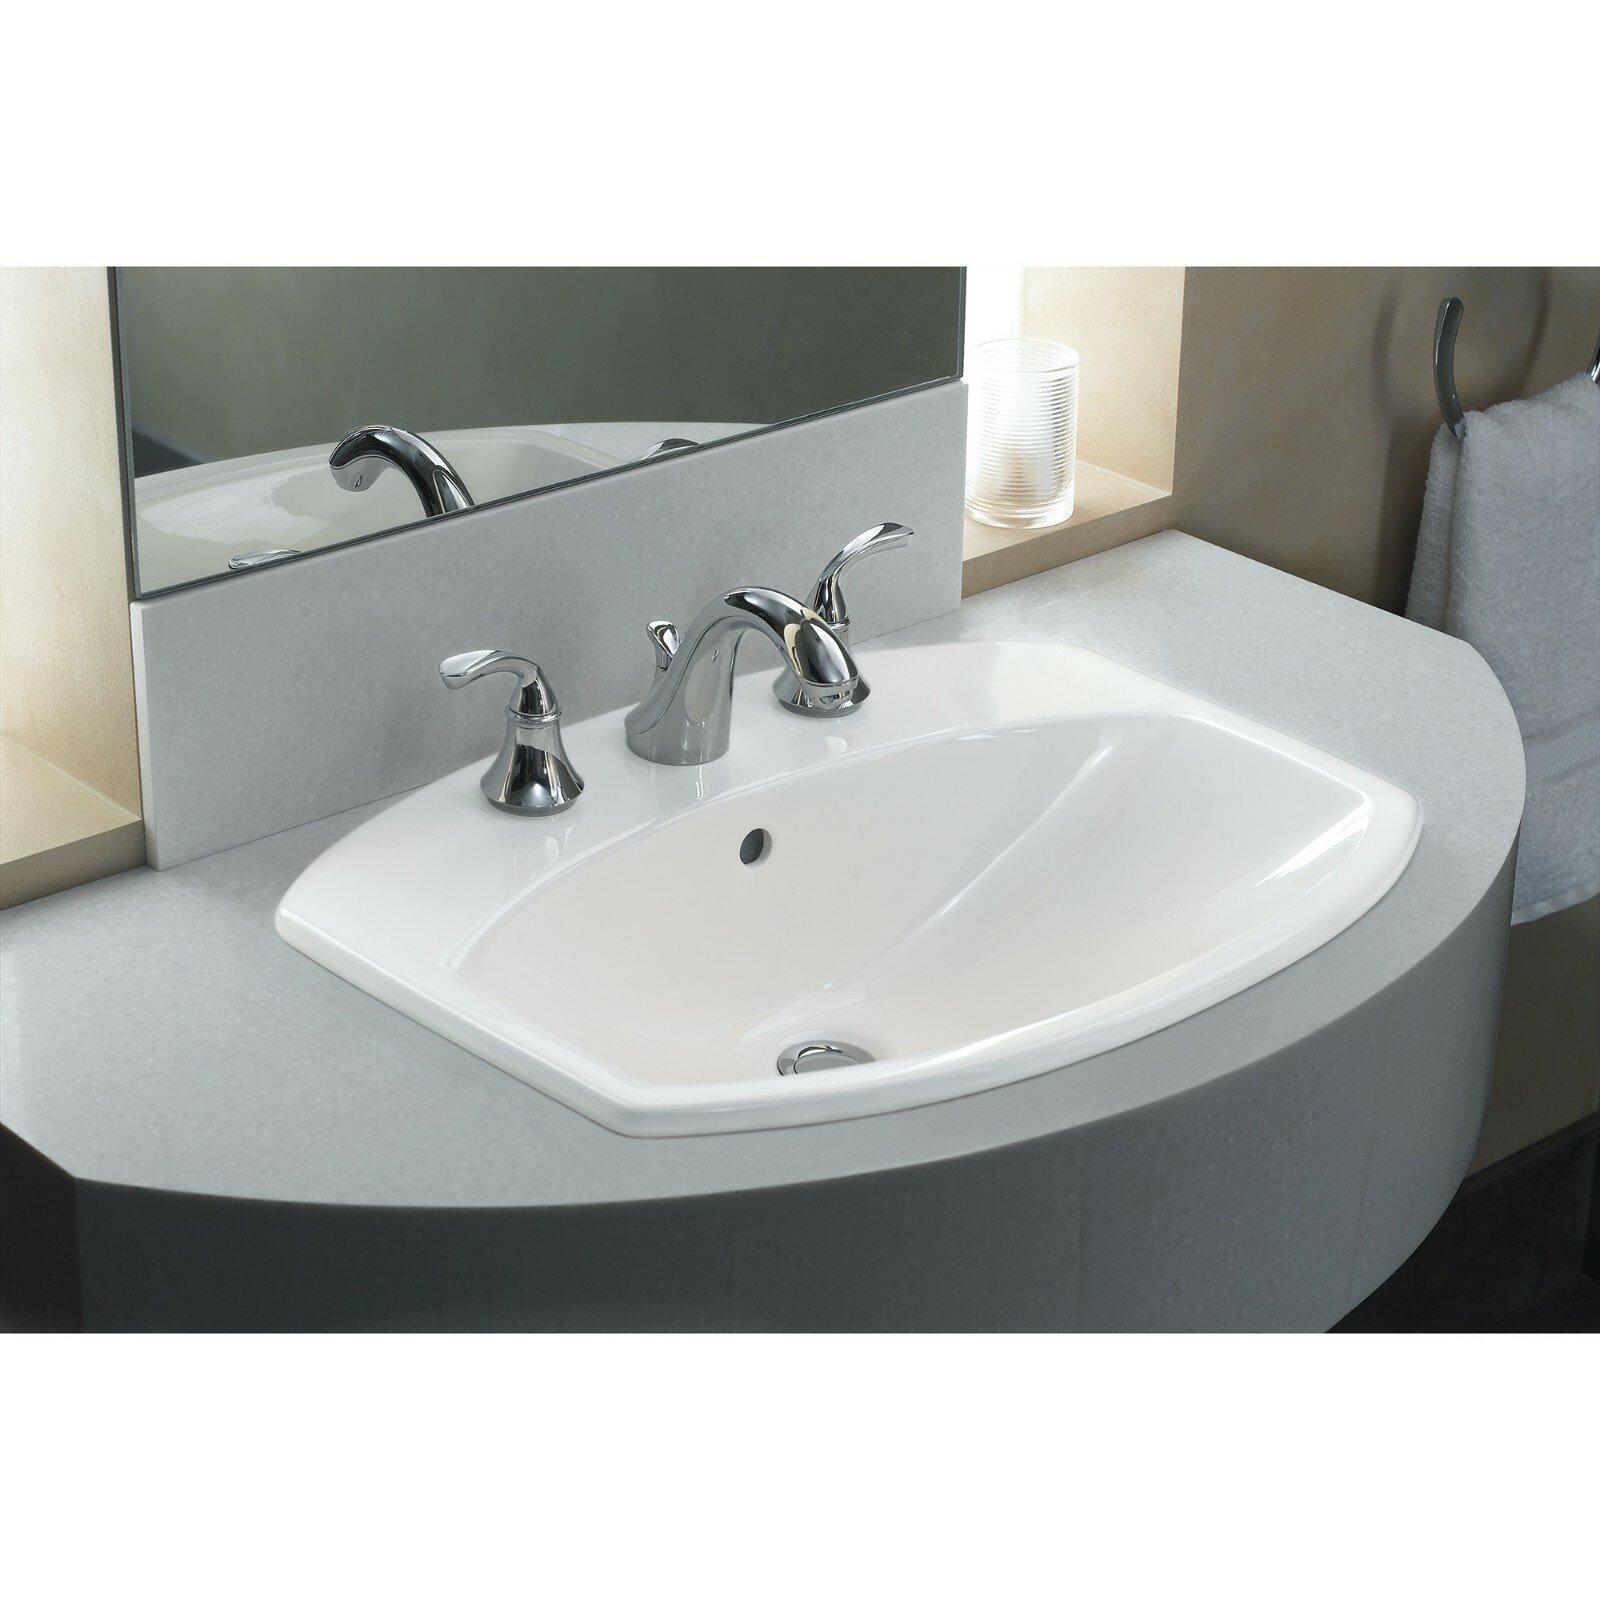 K 2351 8 0 Kohler Cimarron Ceramic Rectangular Drop In Bathroom Sink With Overflow Reviews Wayfair